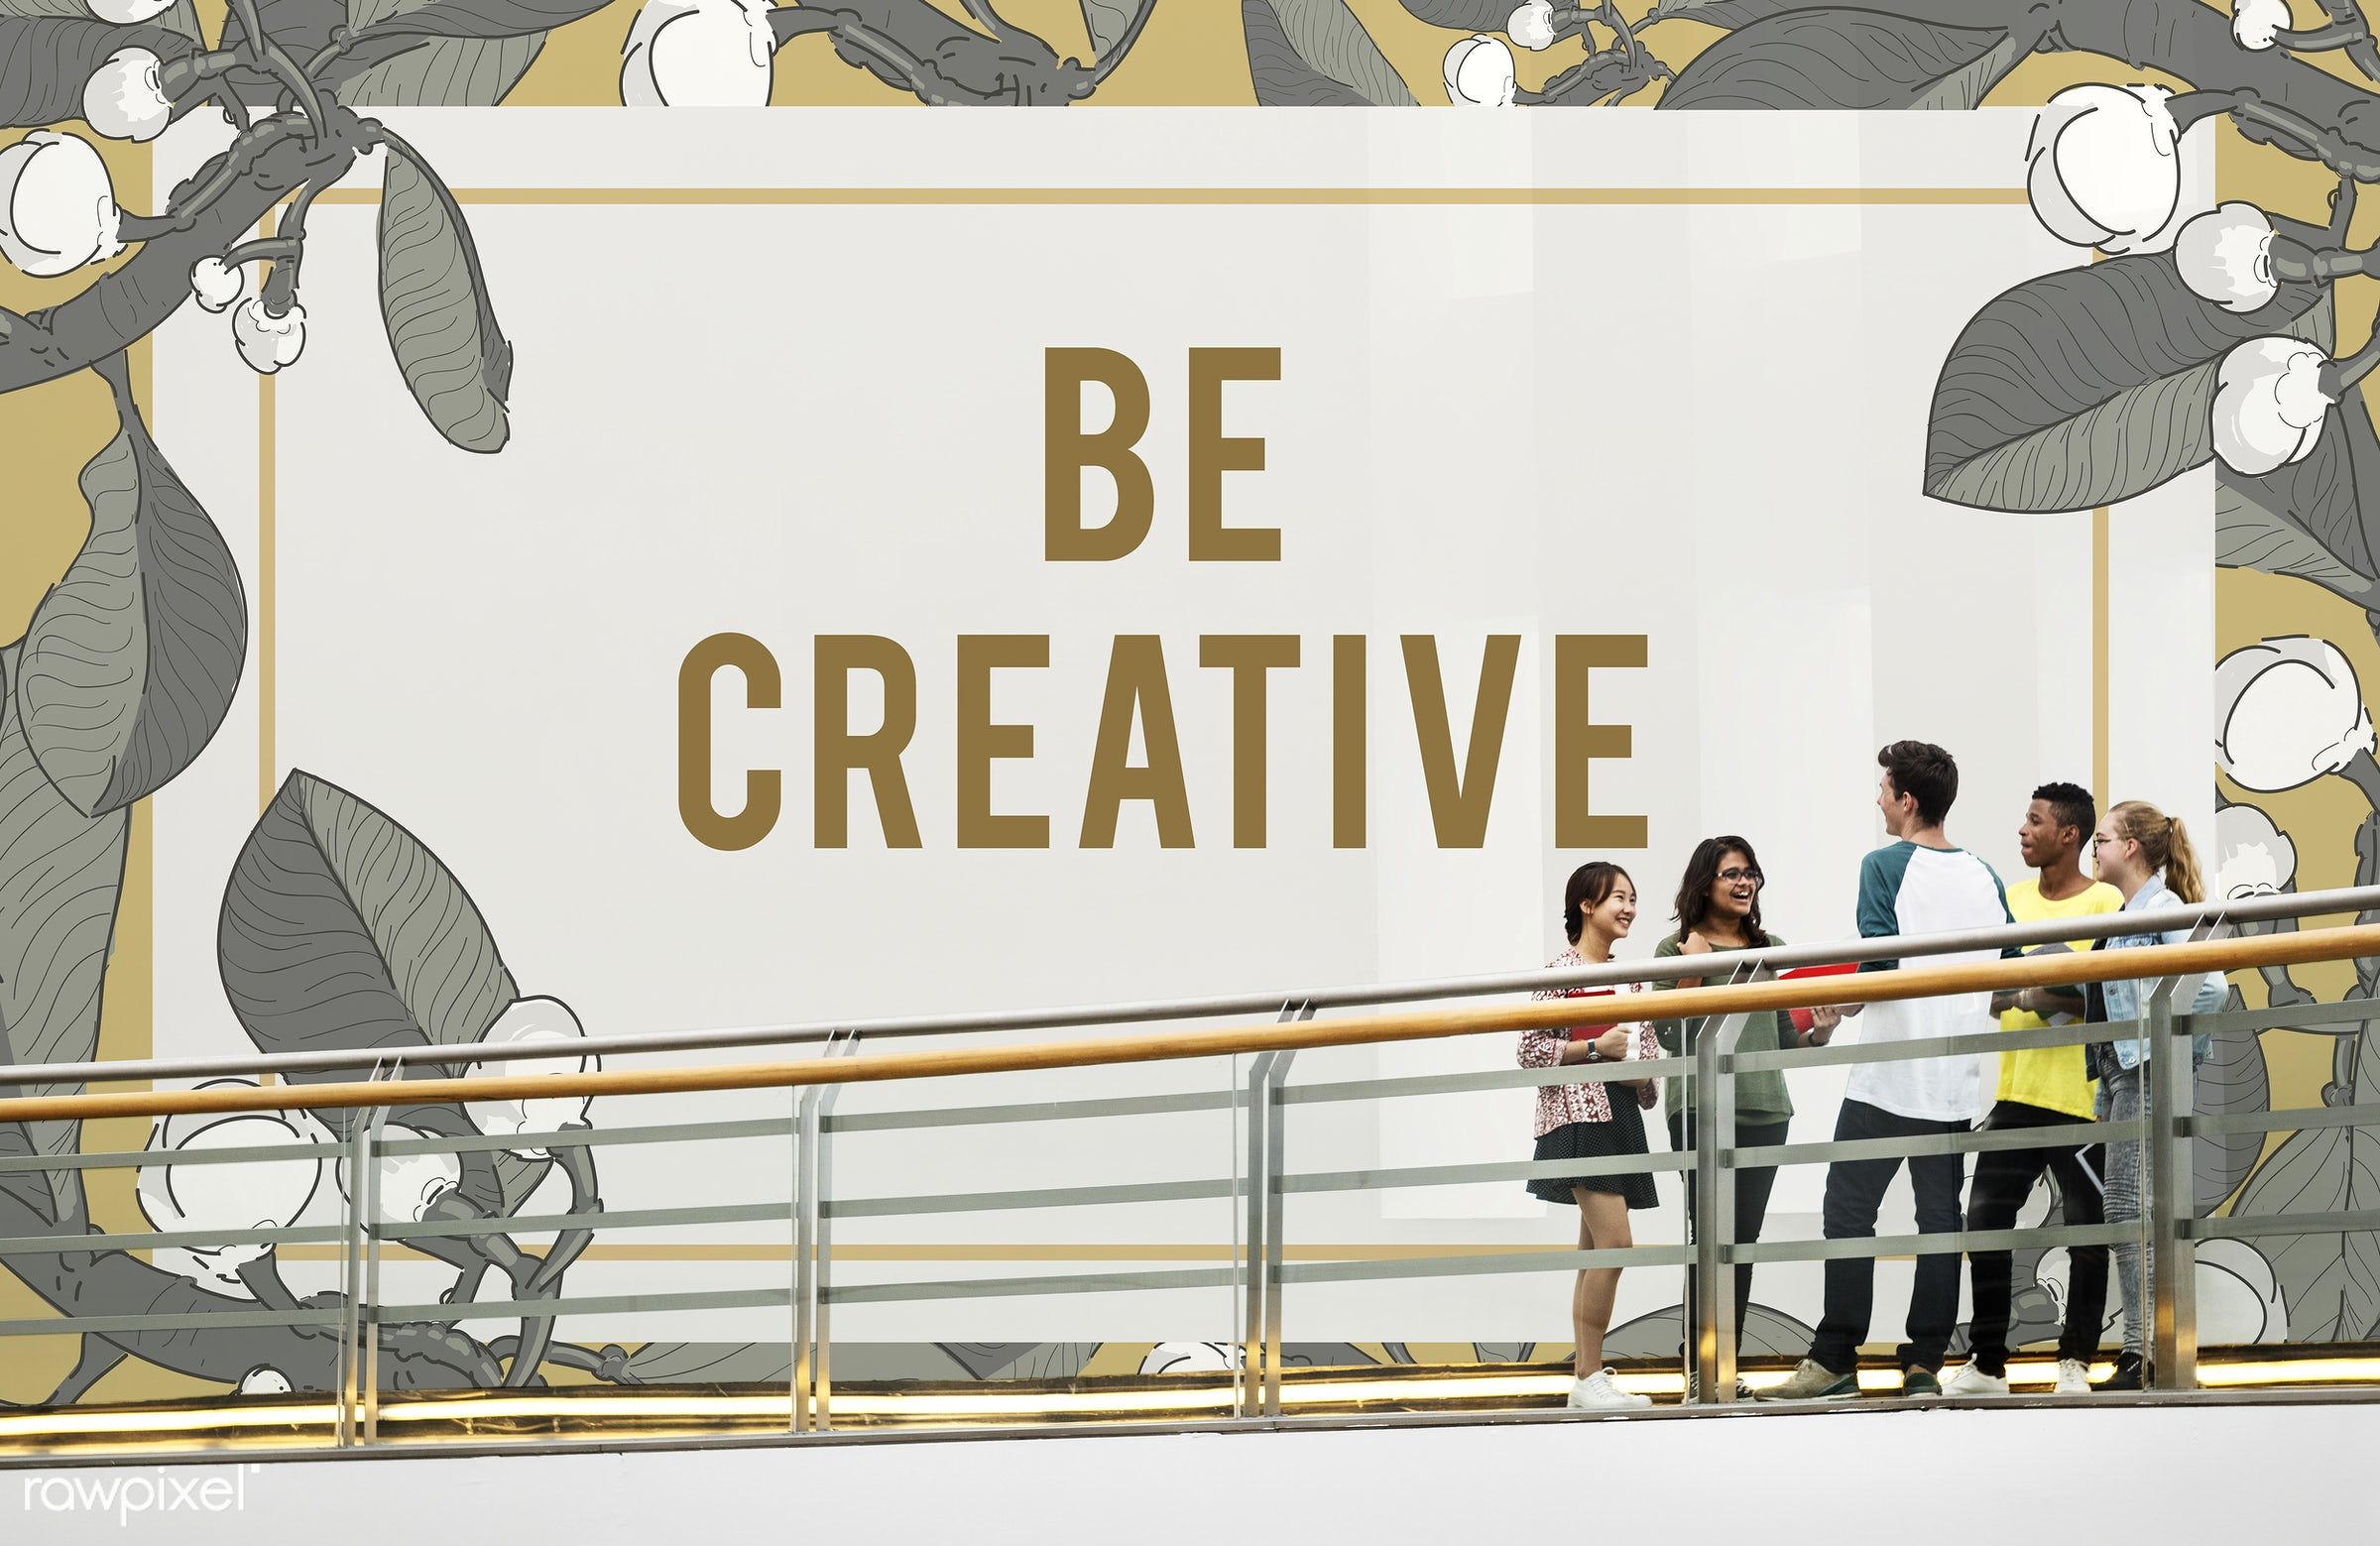 abstract, advertising, artistic, artwork, becreative, book, books, boy, brainstorming, bridge, carrying, creativity, design...